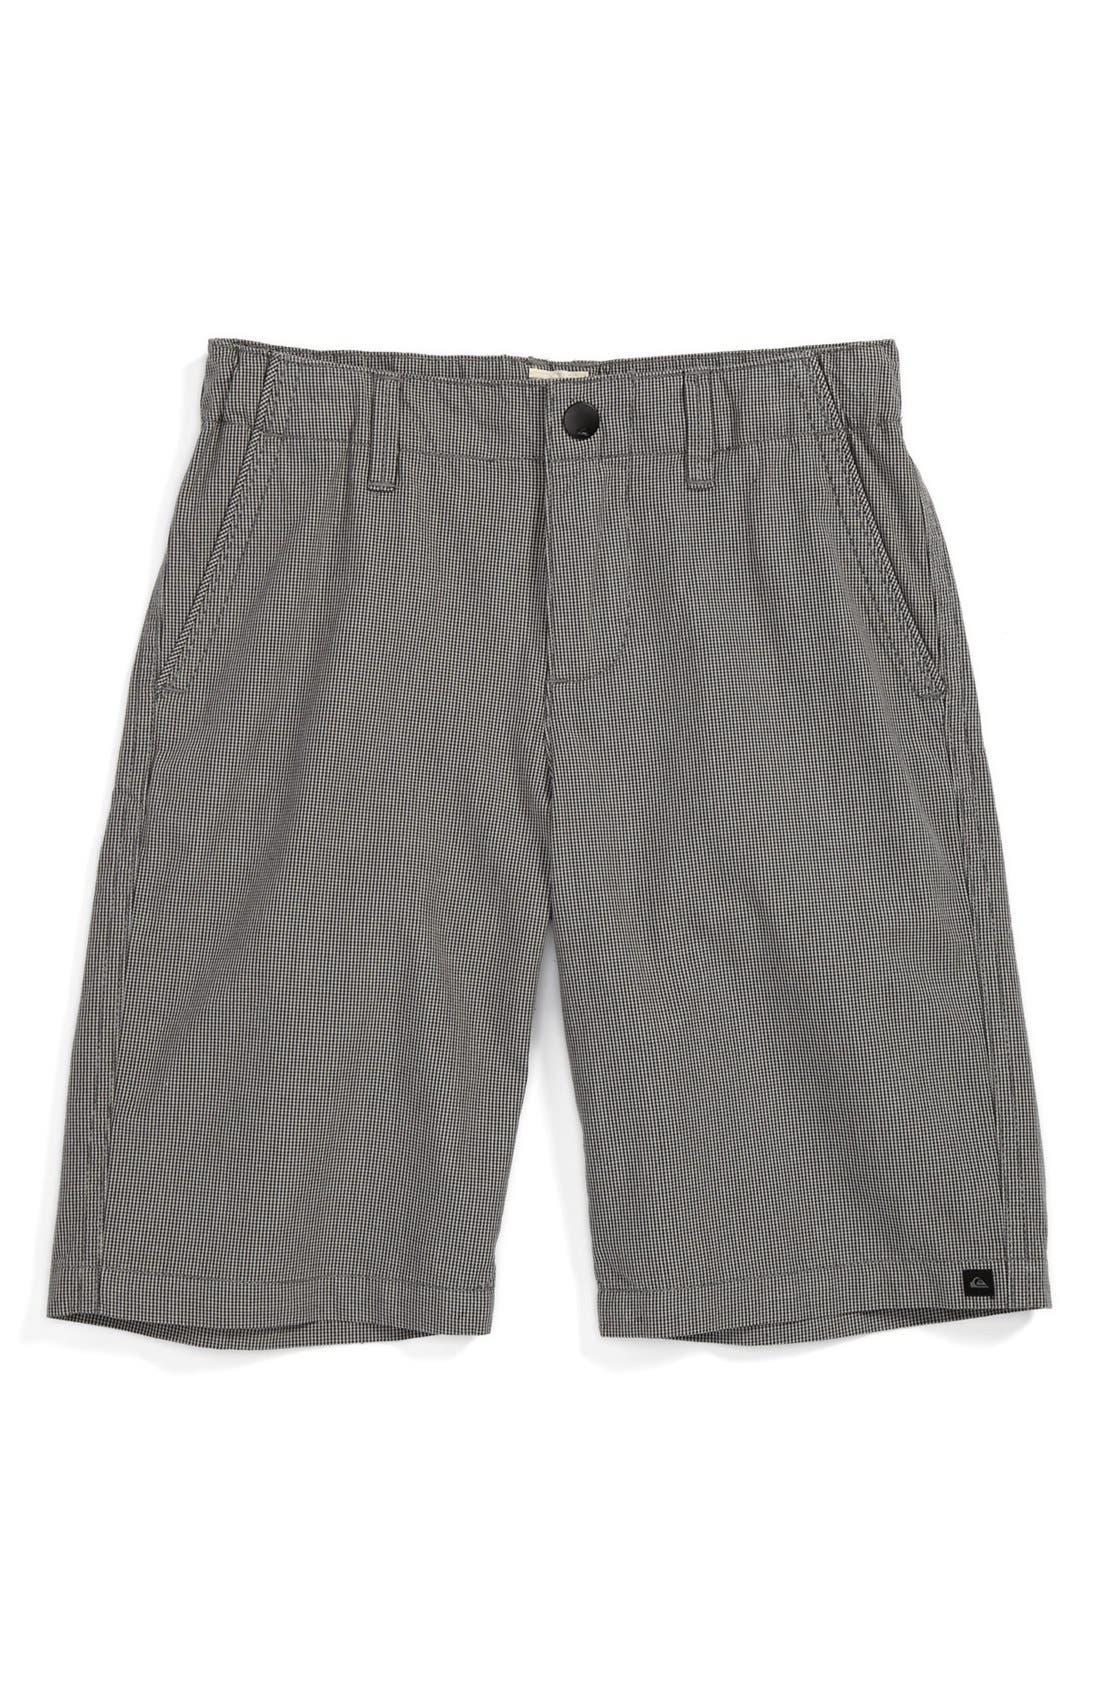 Main Image - Quiksilver 'Nugget' Shorts (Little Boys)